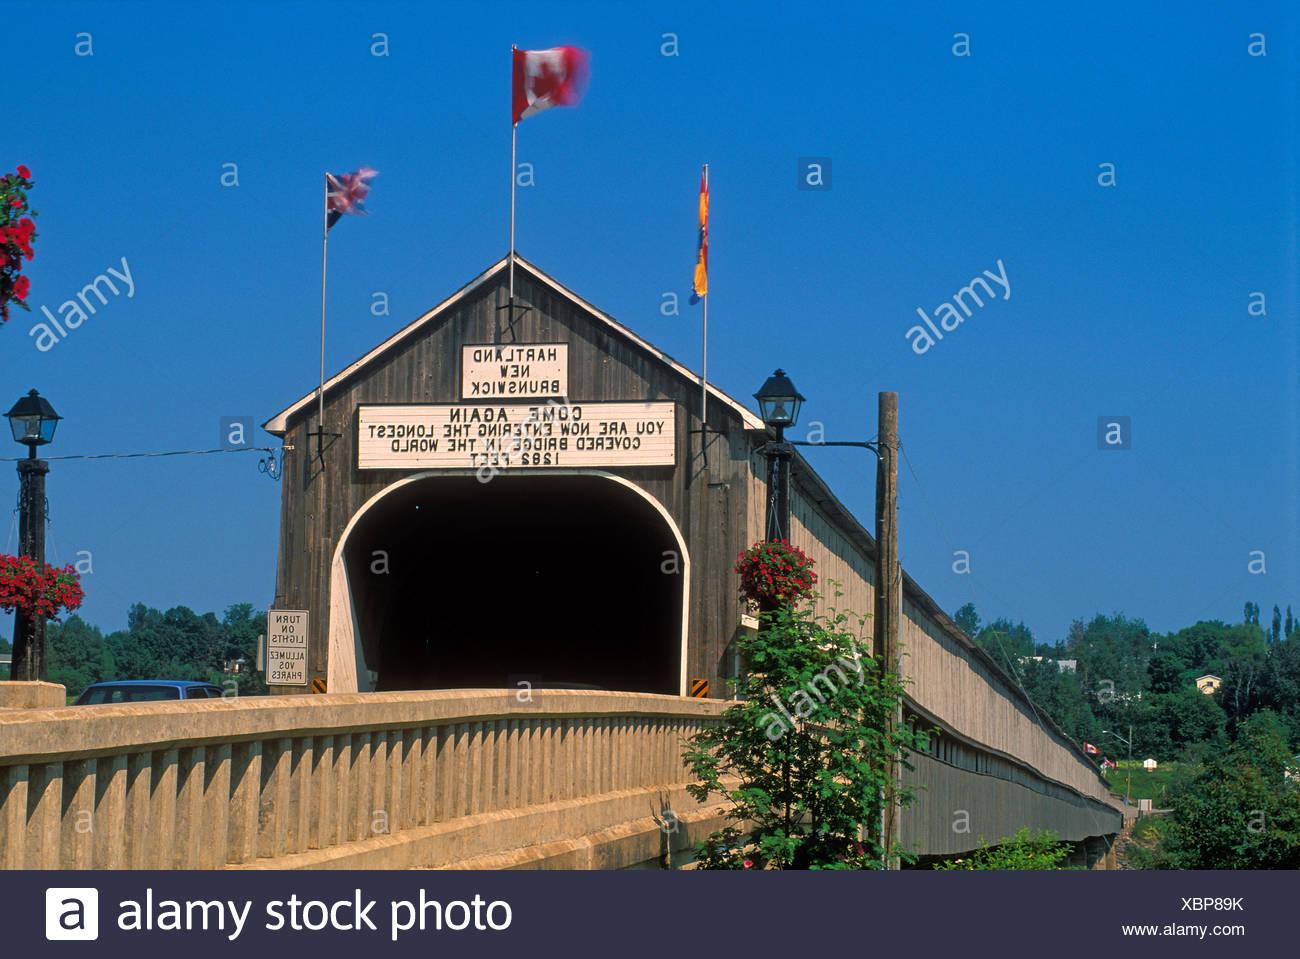 World's Longest Covered Bridge Hartland New Brunswick Canada - Stock Image